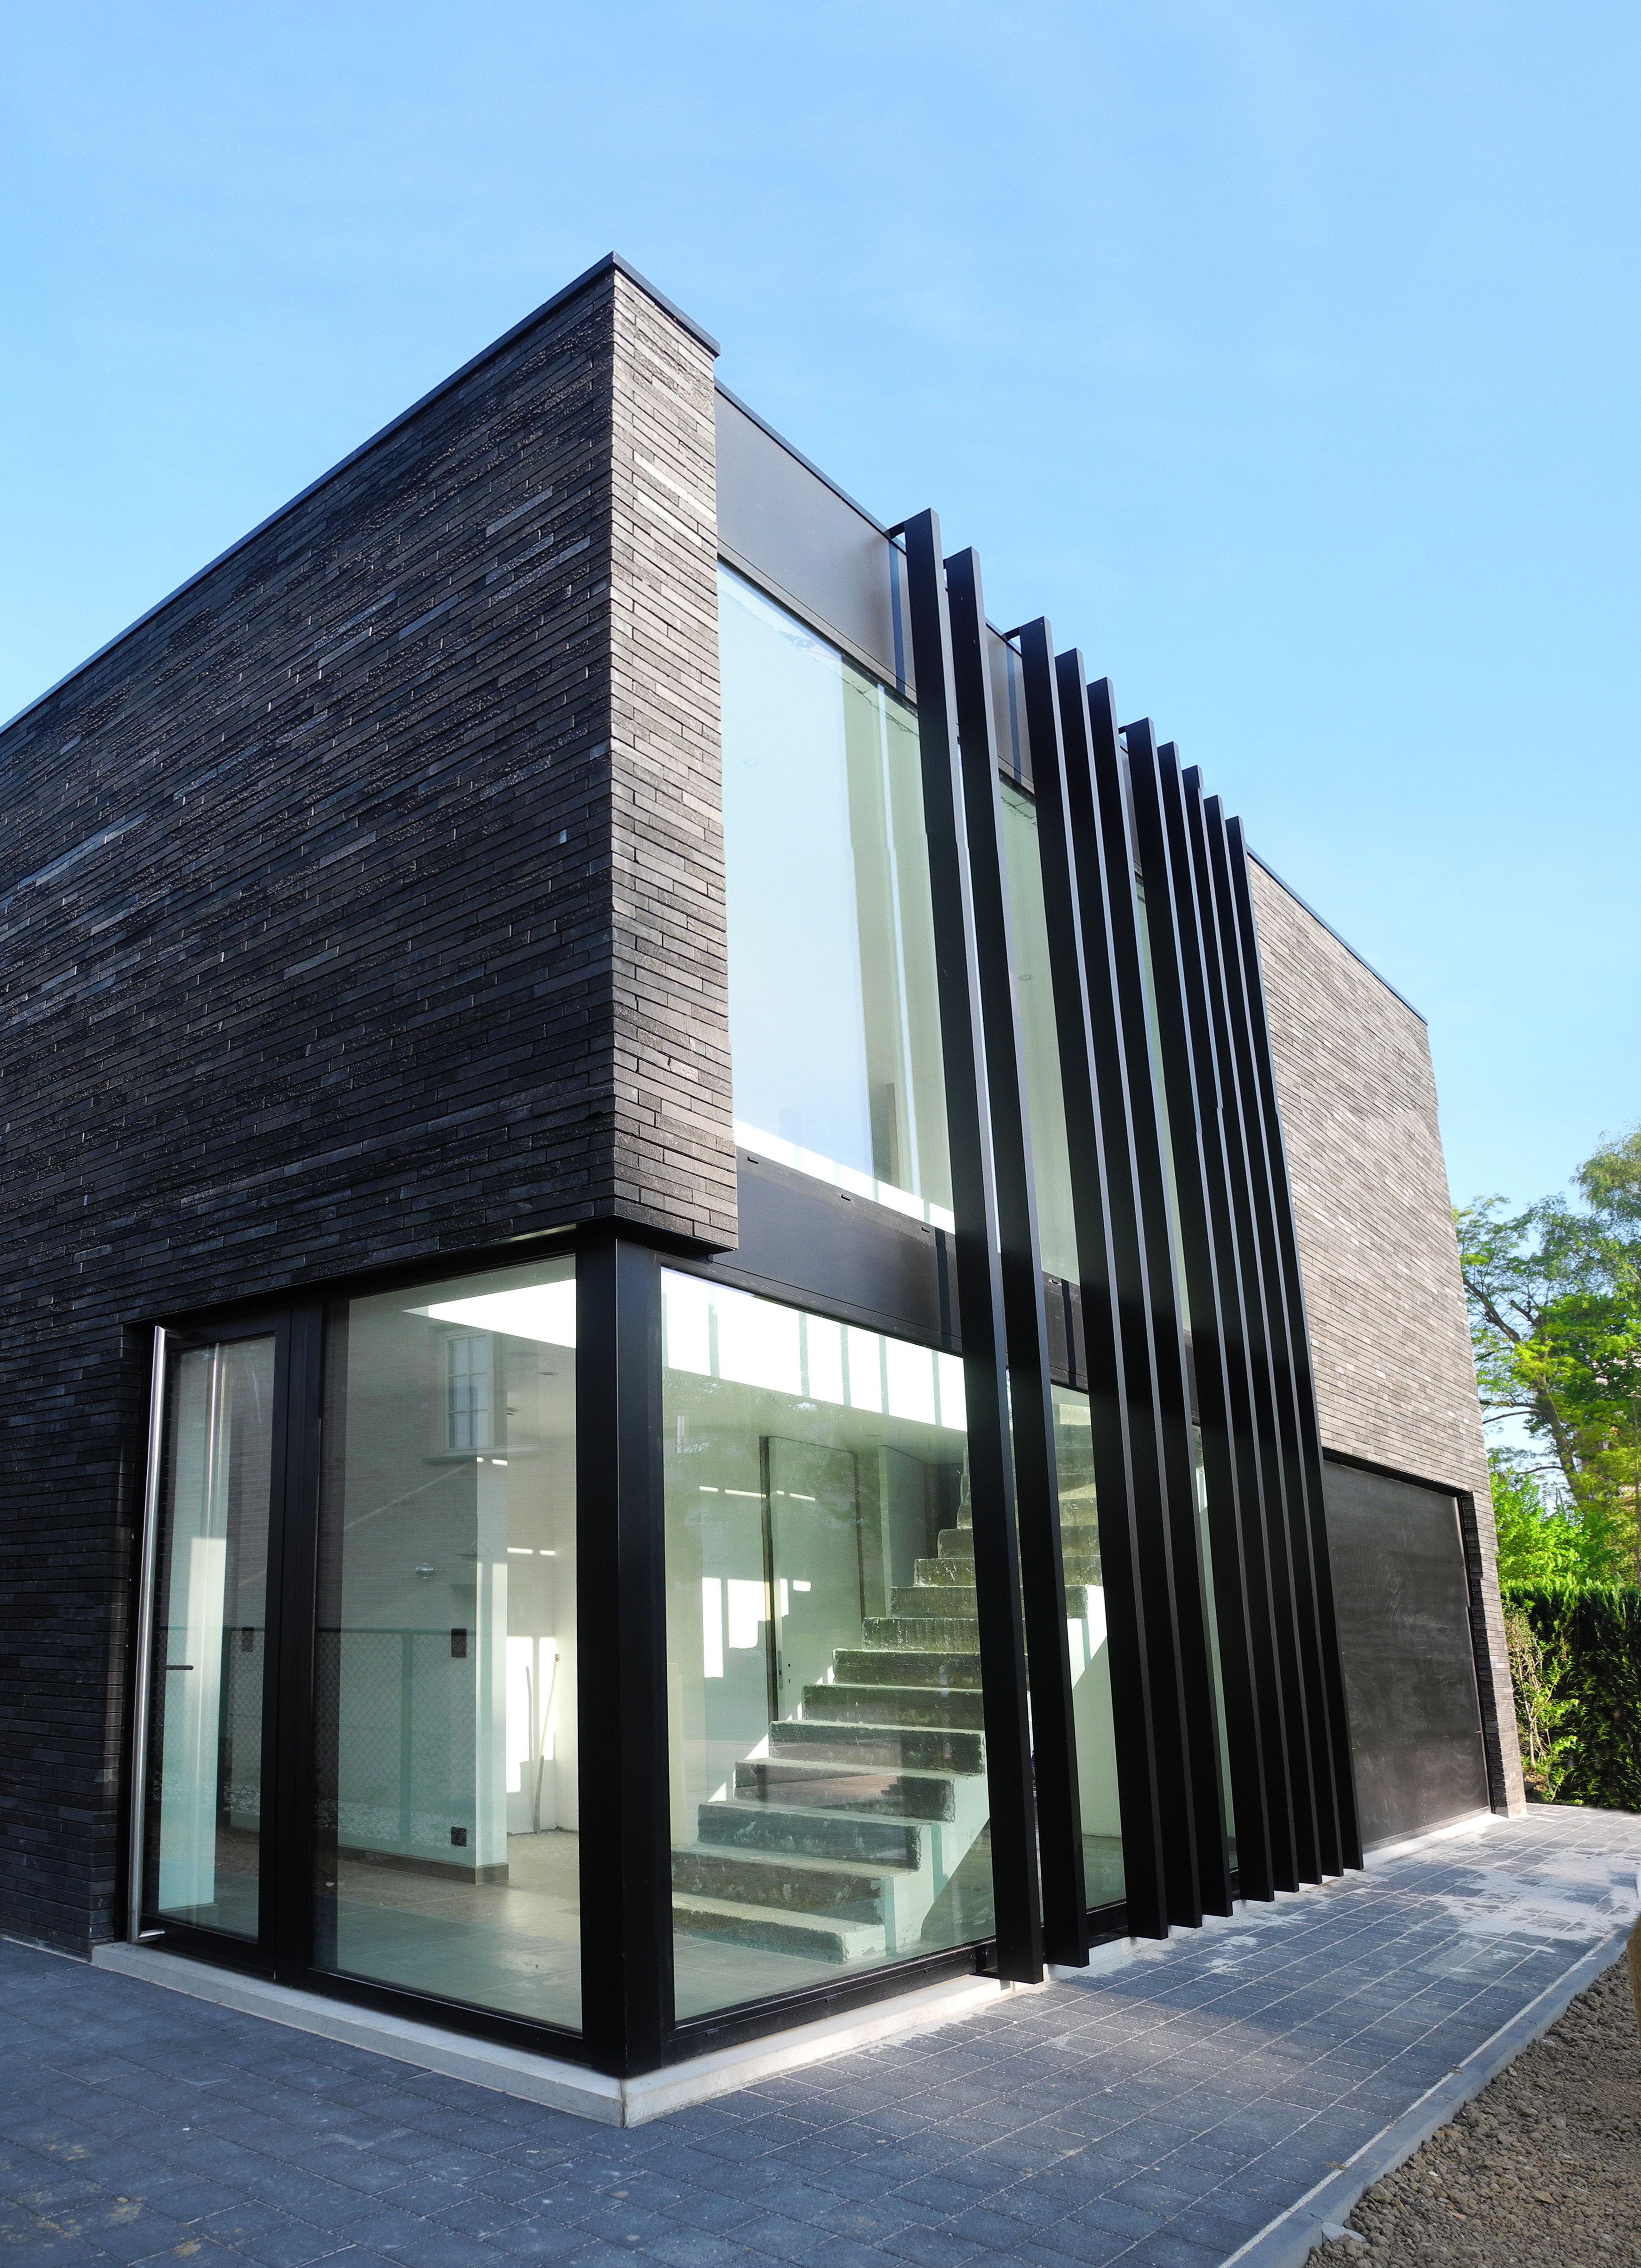 Arcero architecten architectuur en interieur i architect for Interieur architectuur